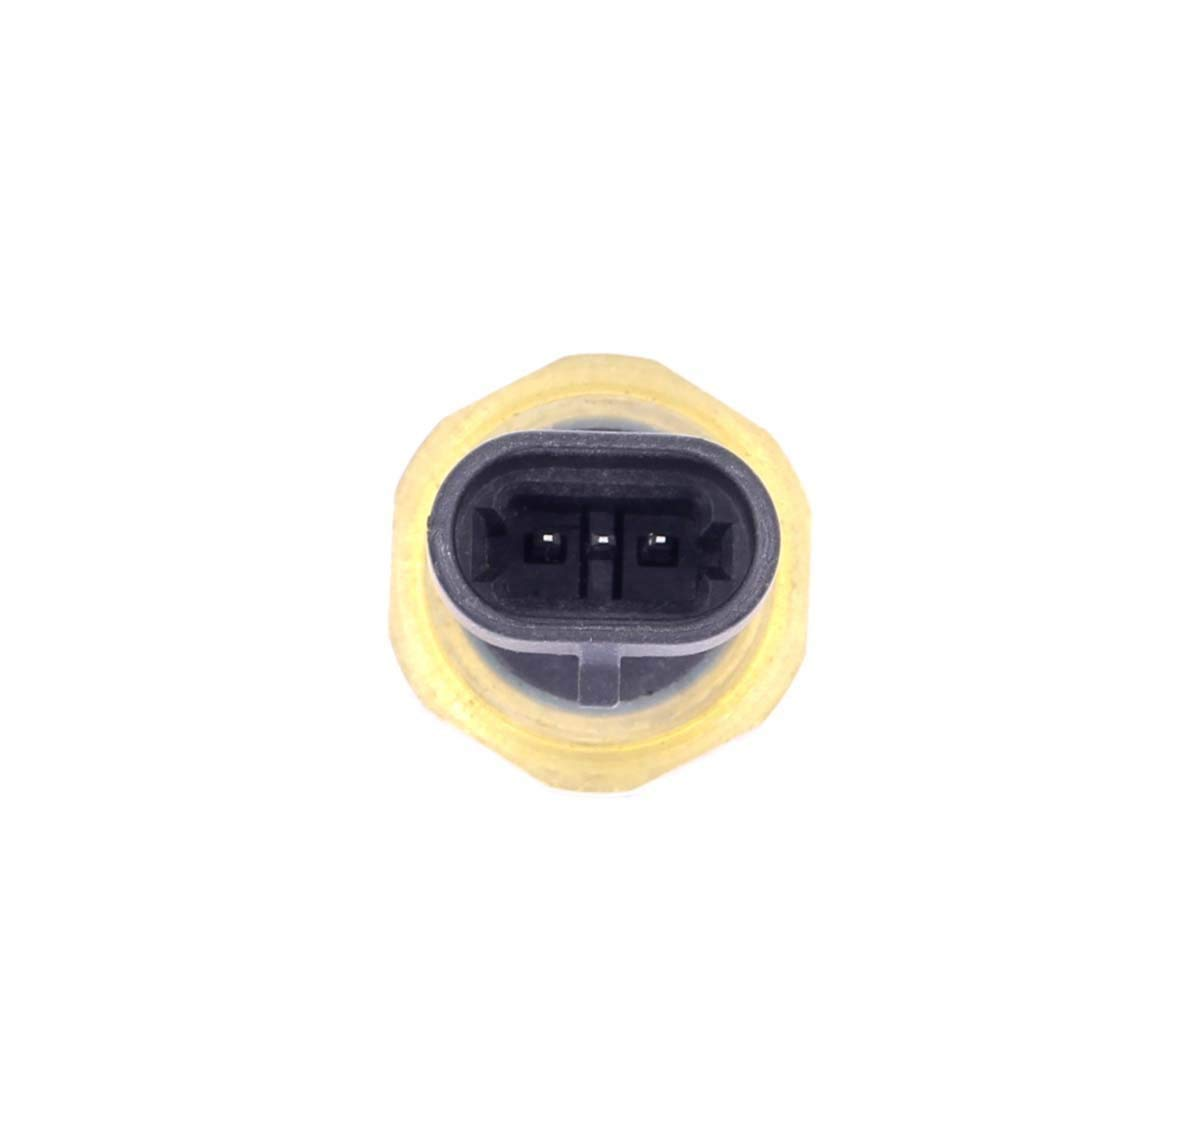 CARBEX Oil Pressure Sensor 4921511 for Cummins Dodge 5.9L 24V 1998-2002 by CARBEX (Image #4)